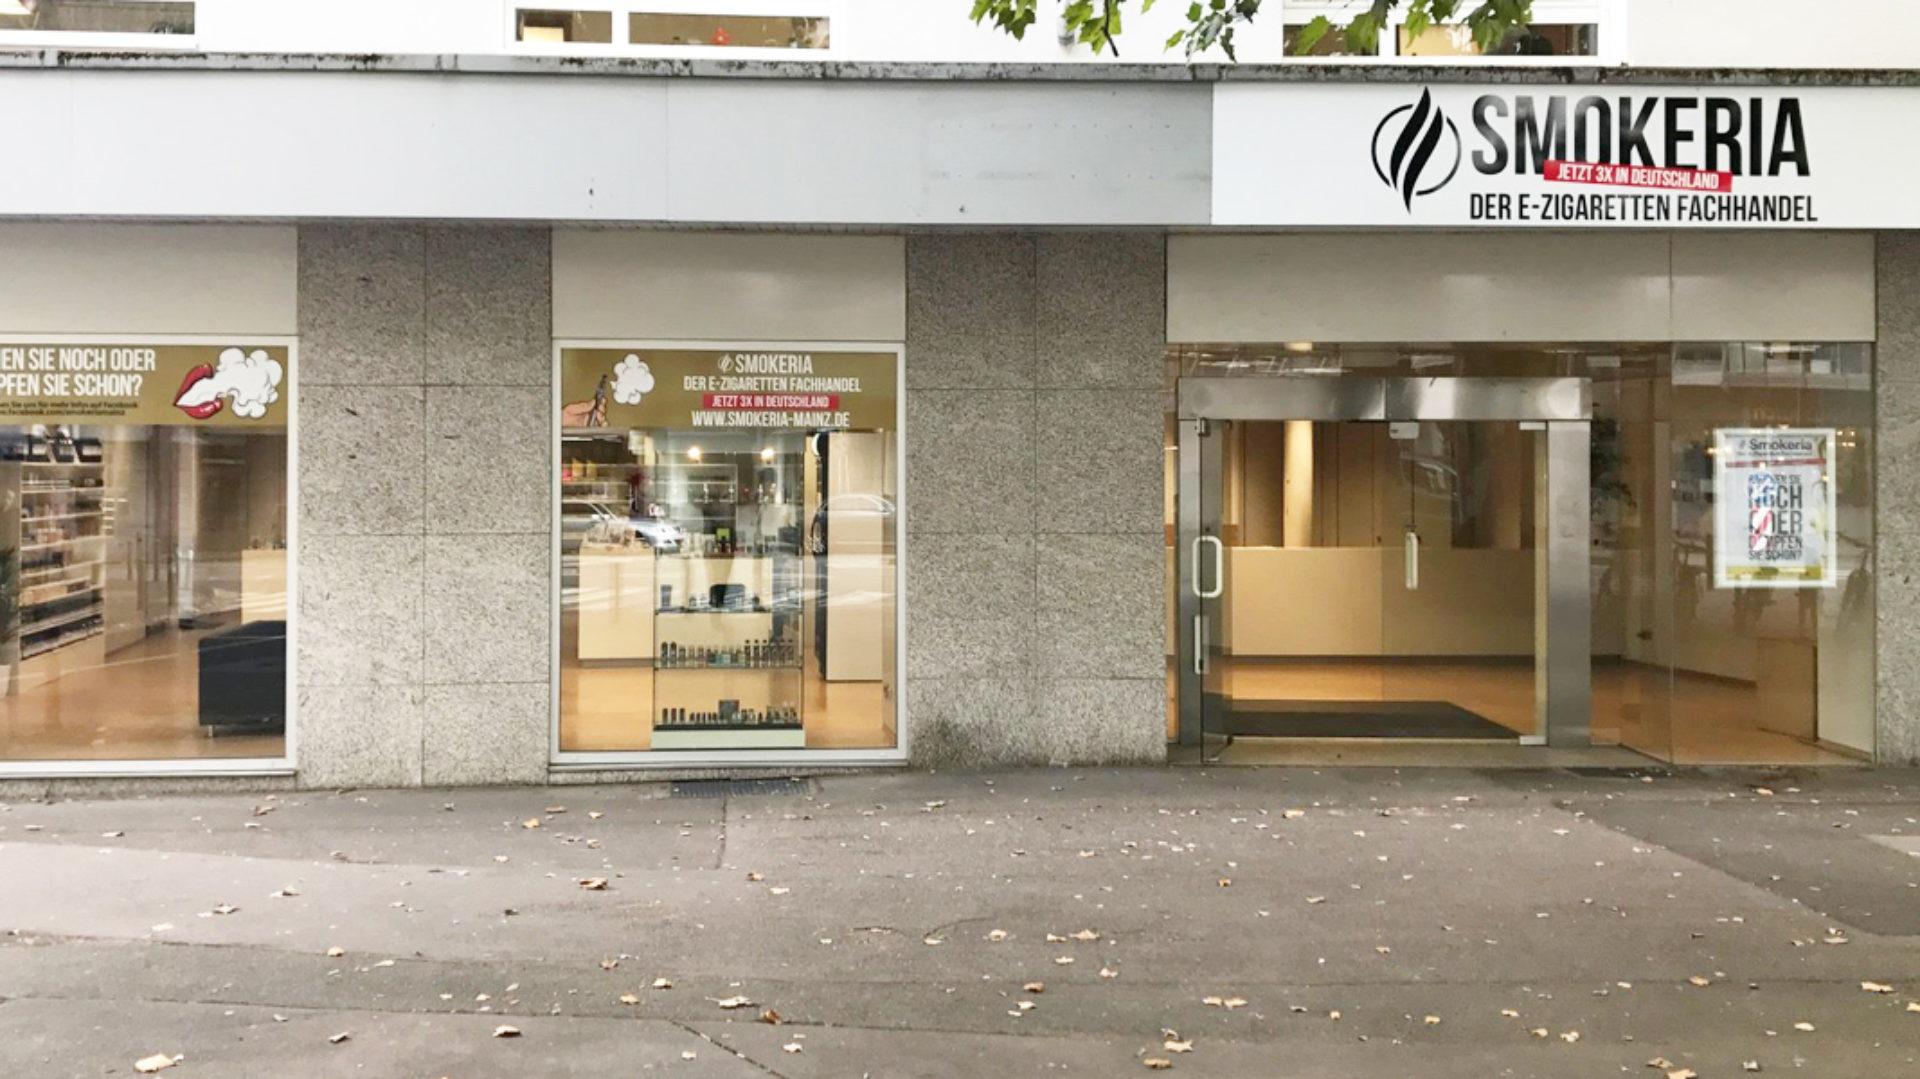 Smokeria E-Zigaretten Fachhandel Mainz